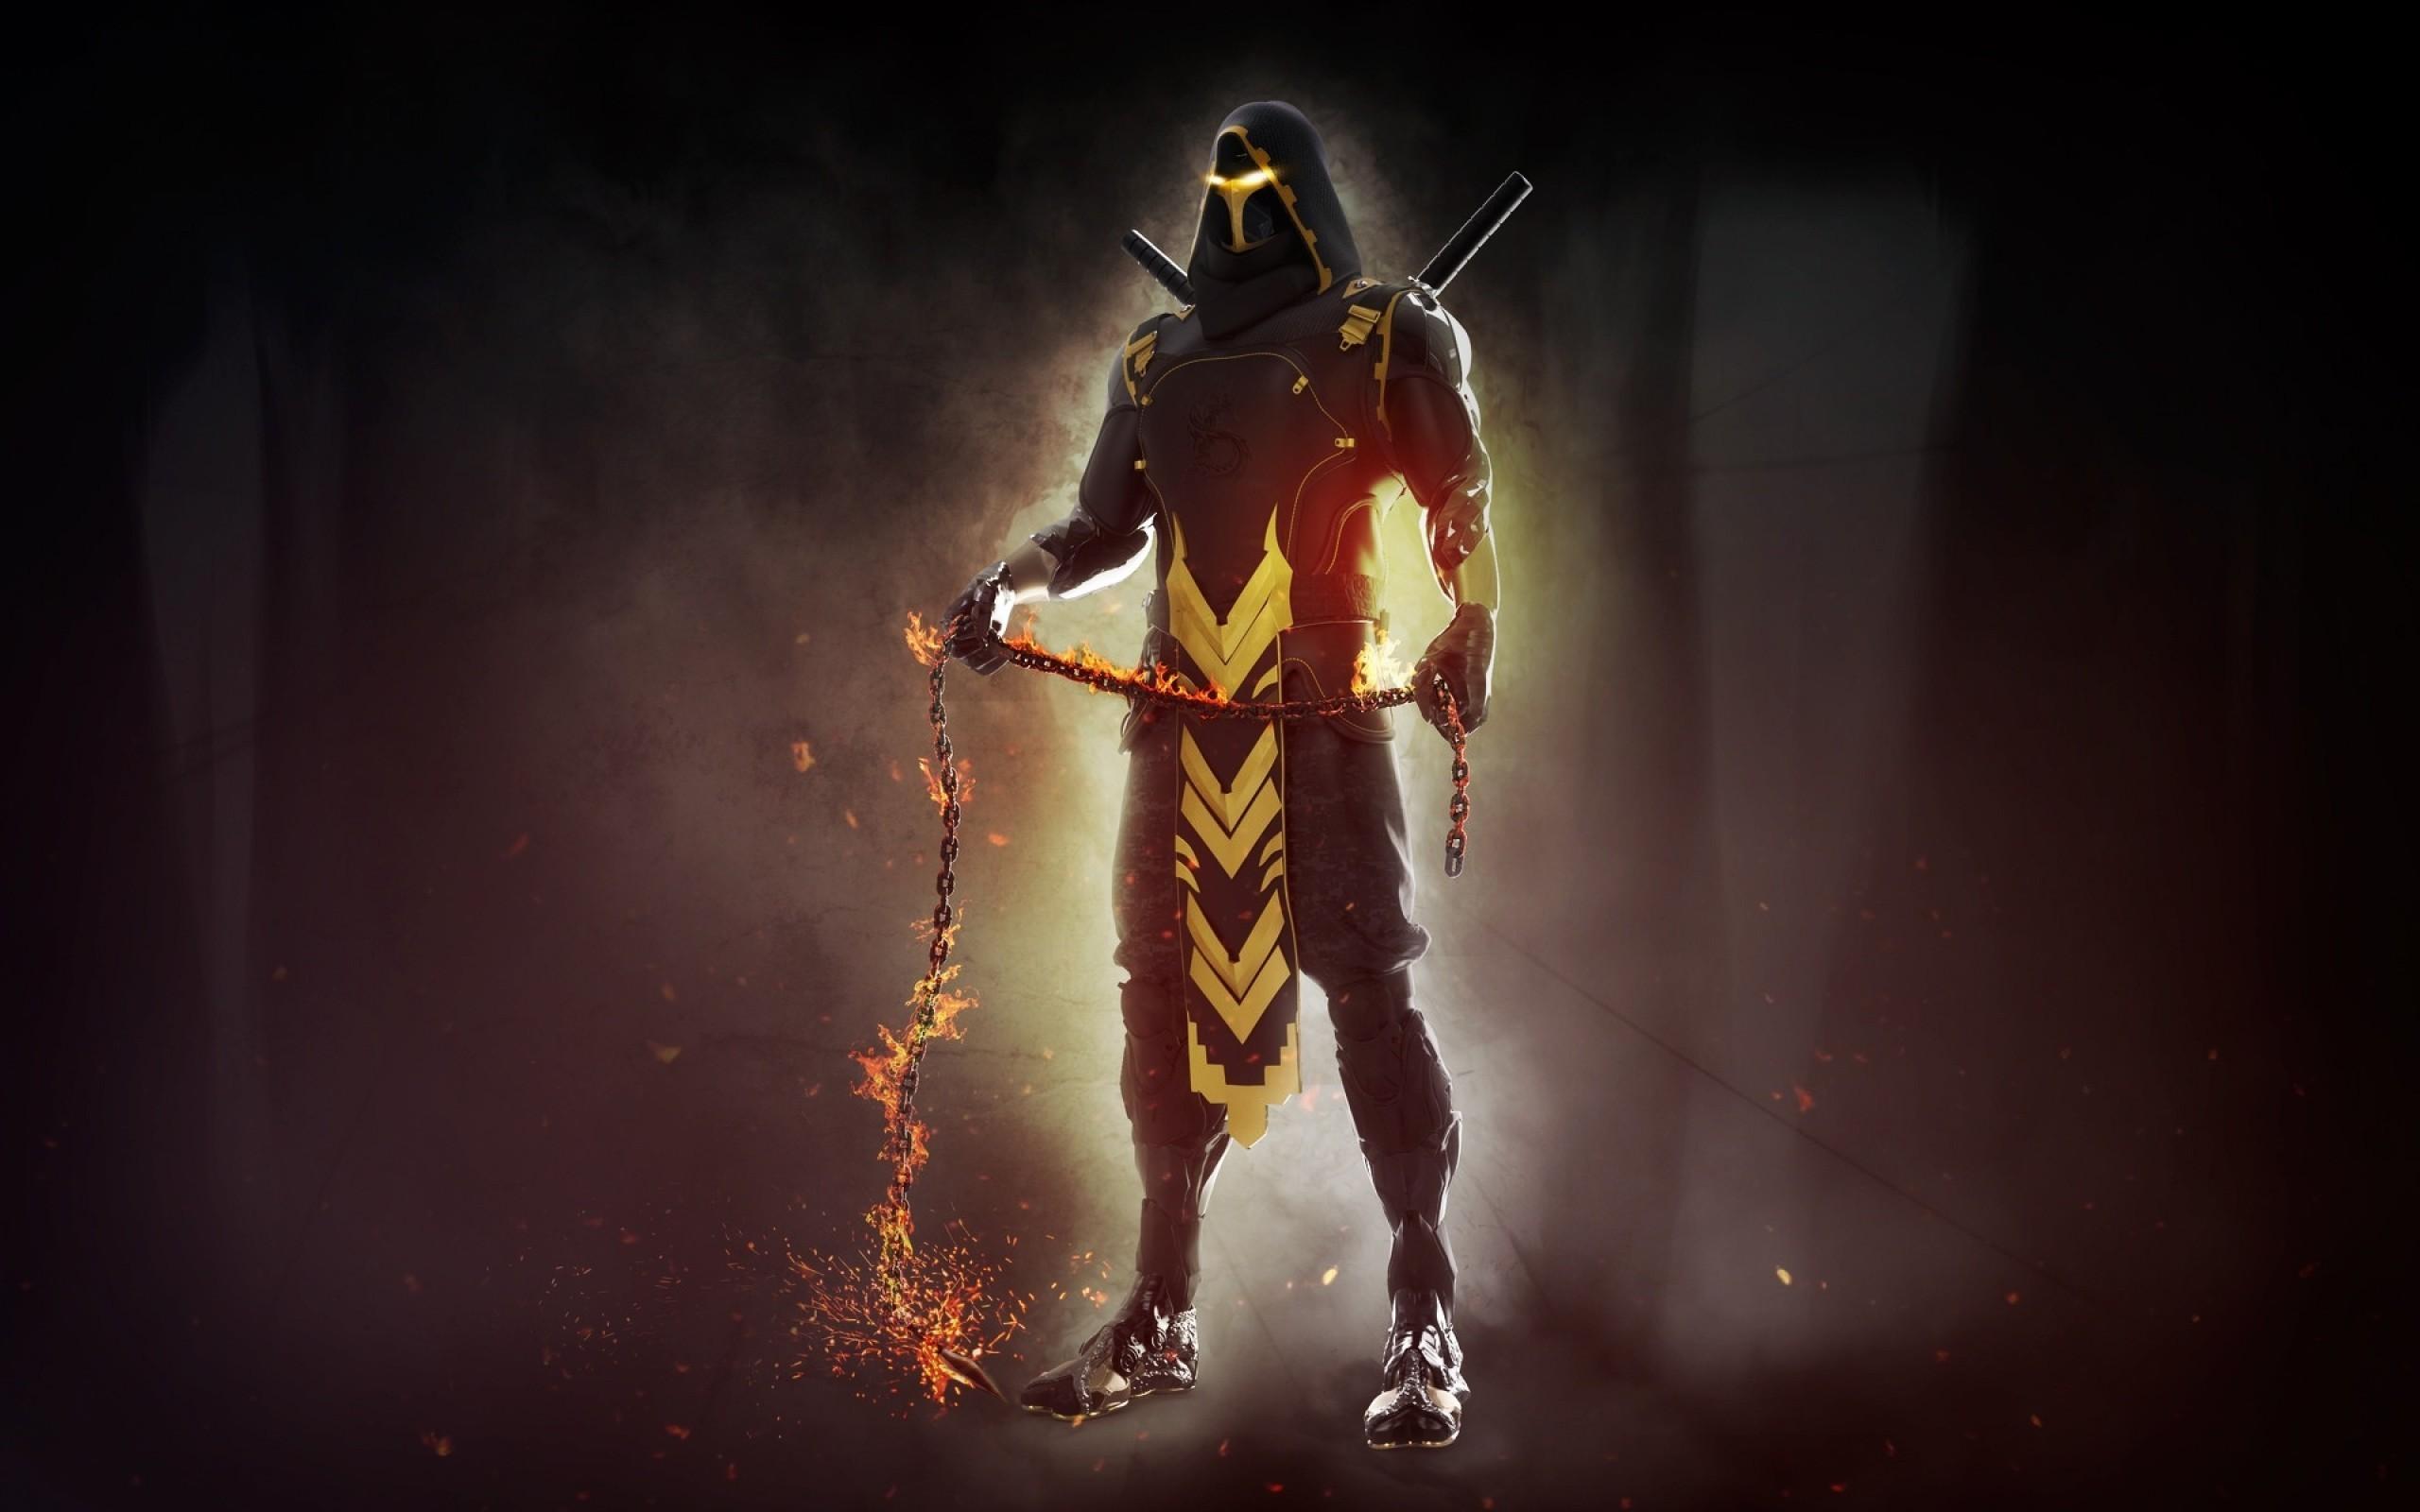 Res: 2560x1600, Download  Mortal Kombat Scorpion Wallpapers For Macbook